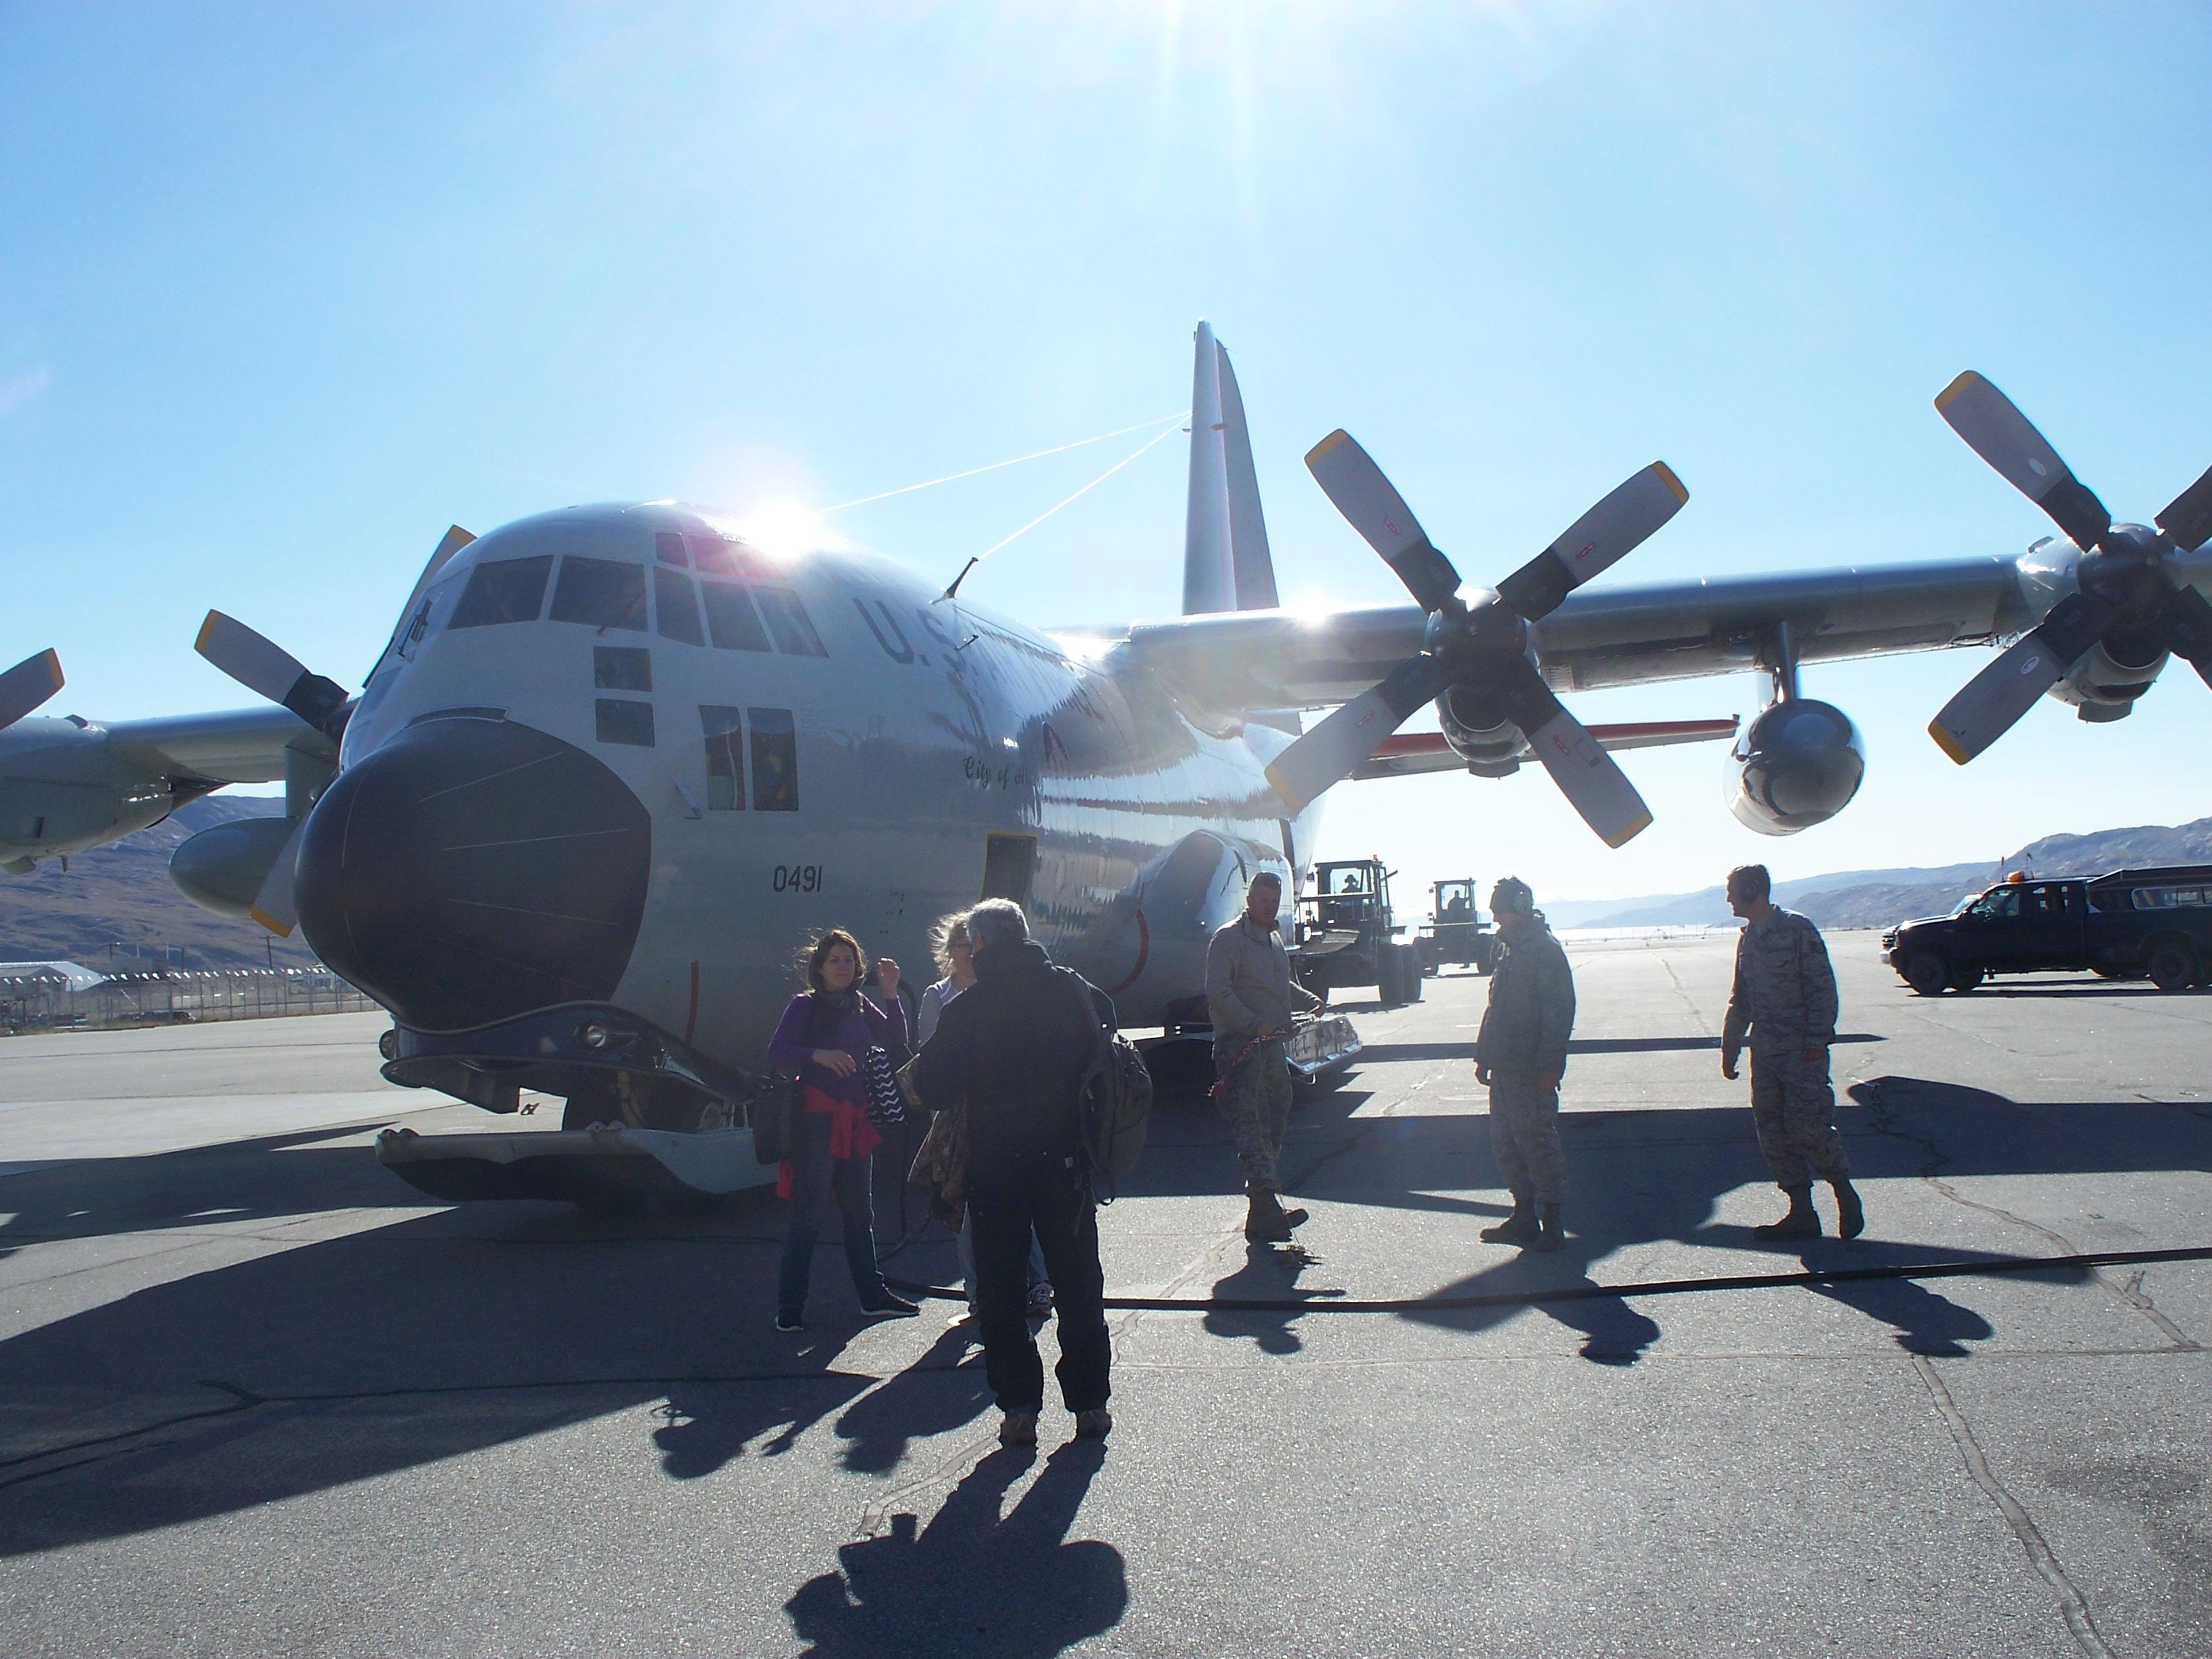 Plane From Kangerlussuaq to Summit